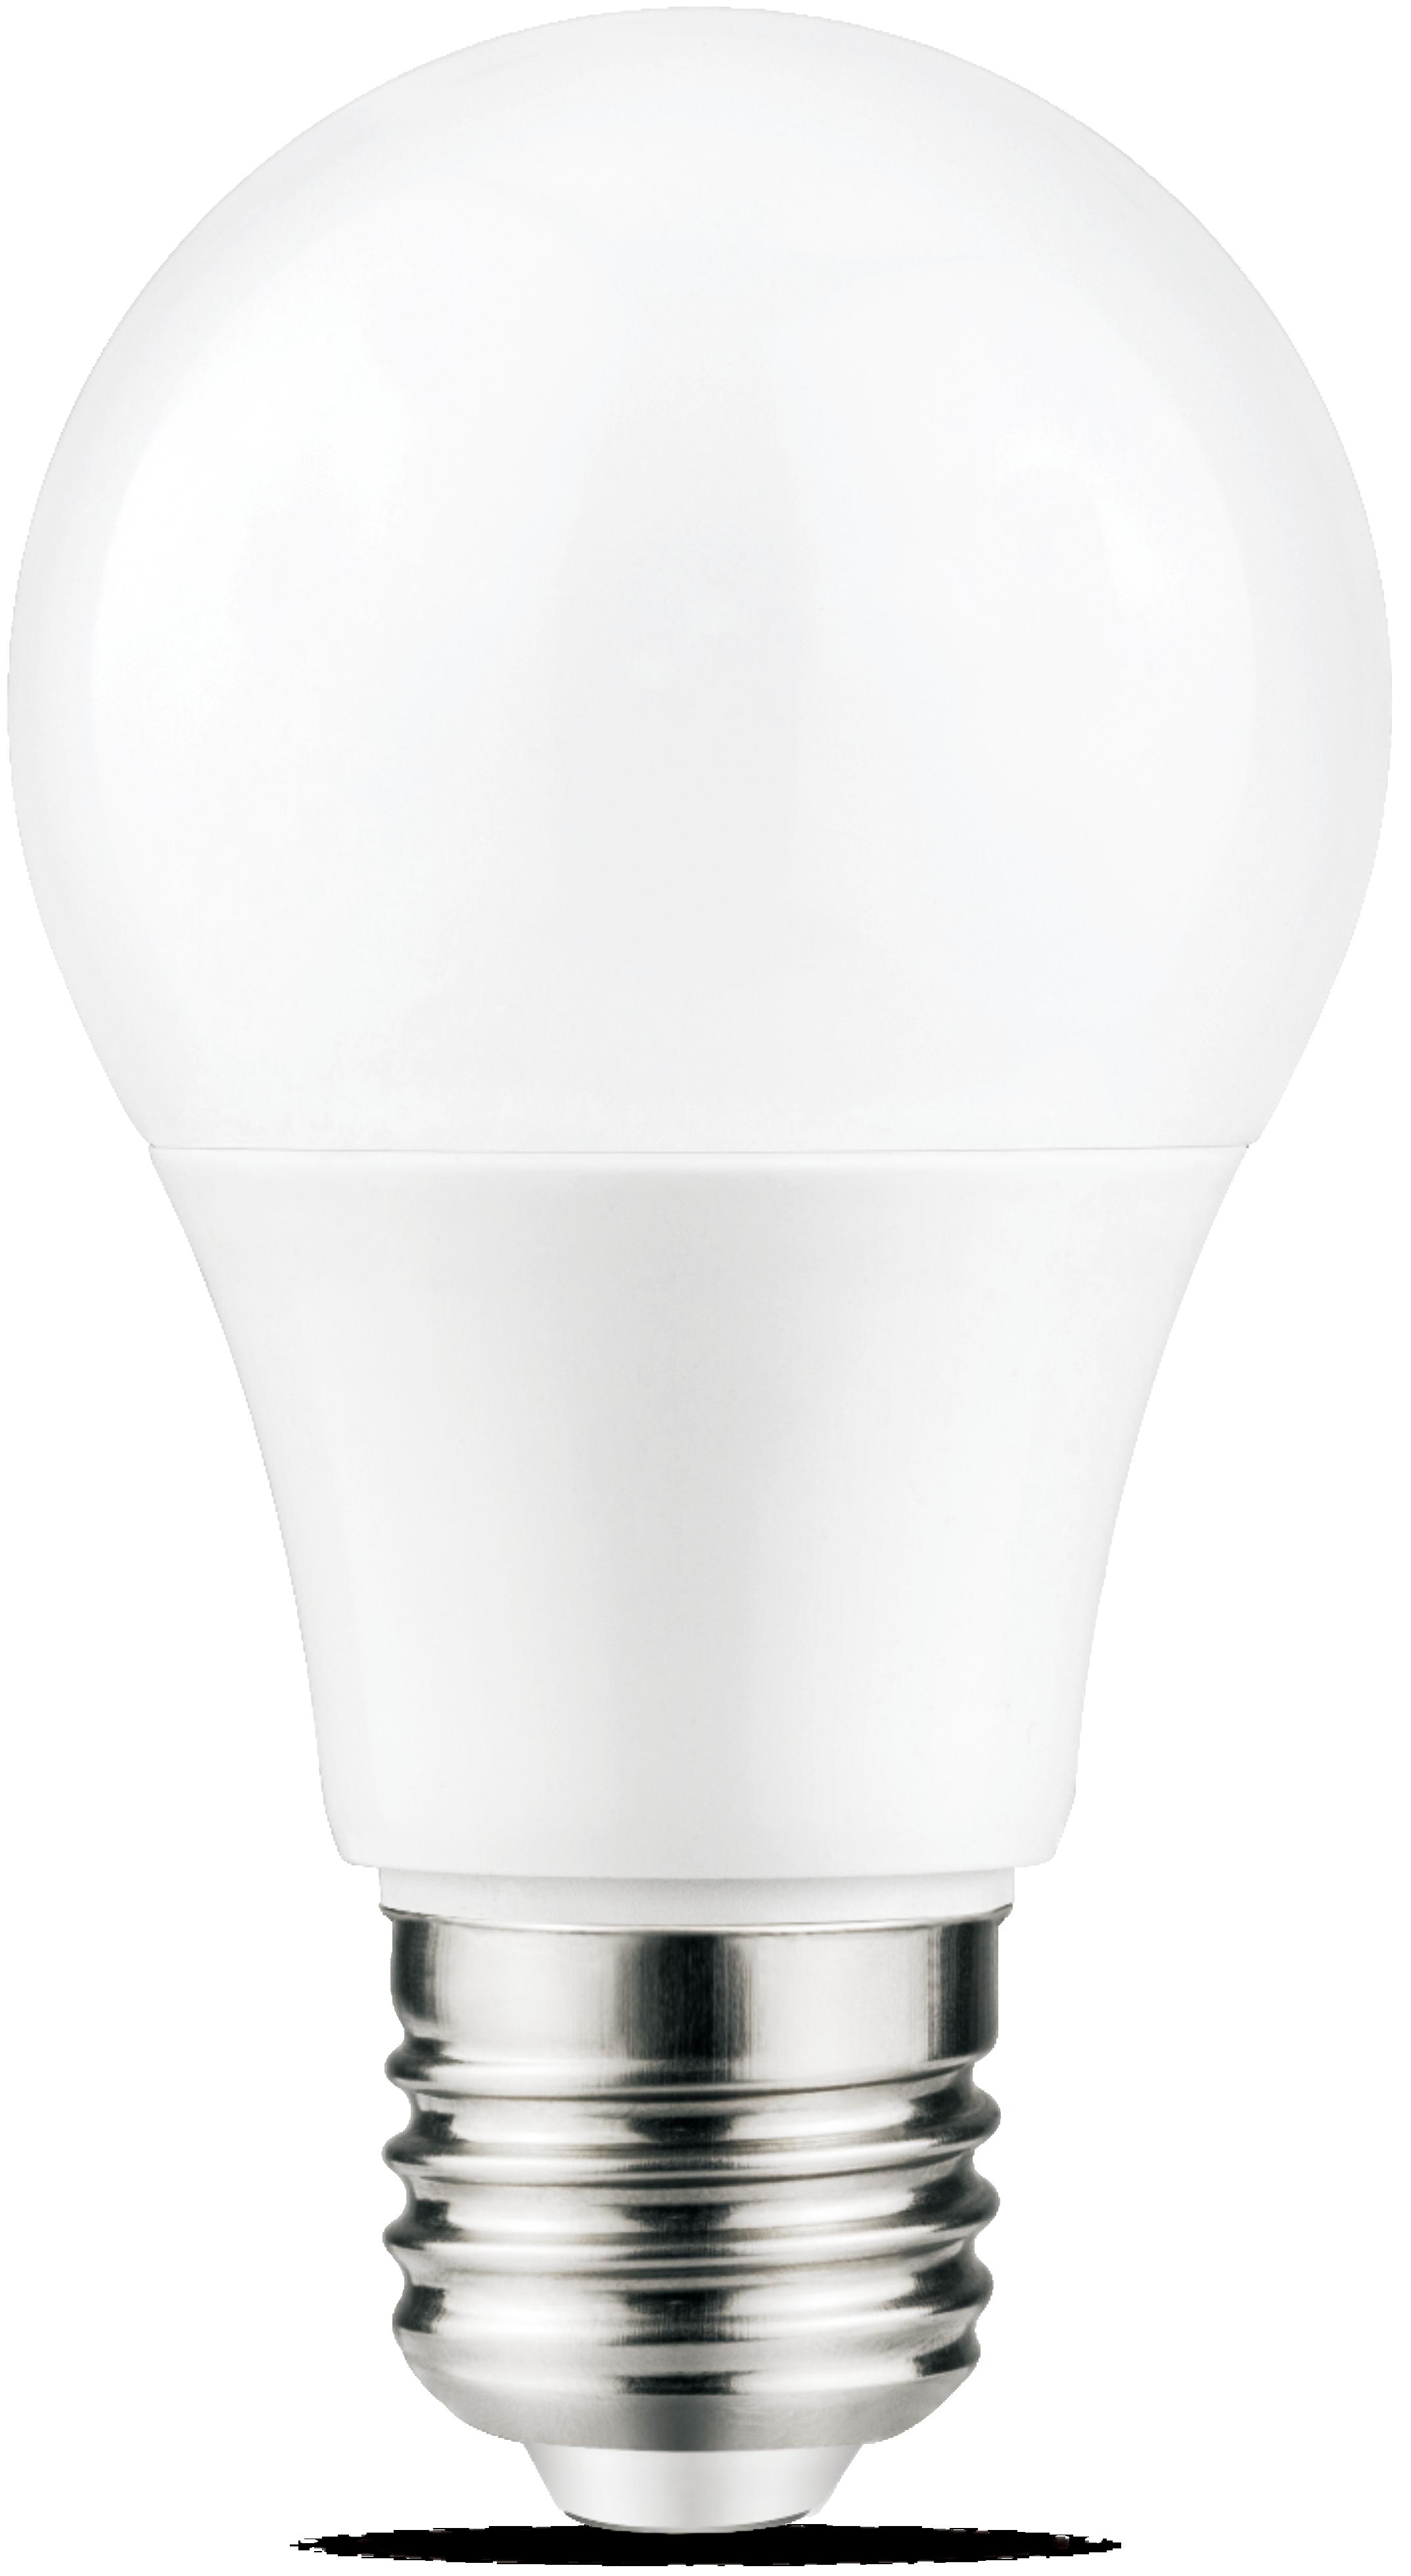 LED室内超亮节能锐士球泡灯